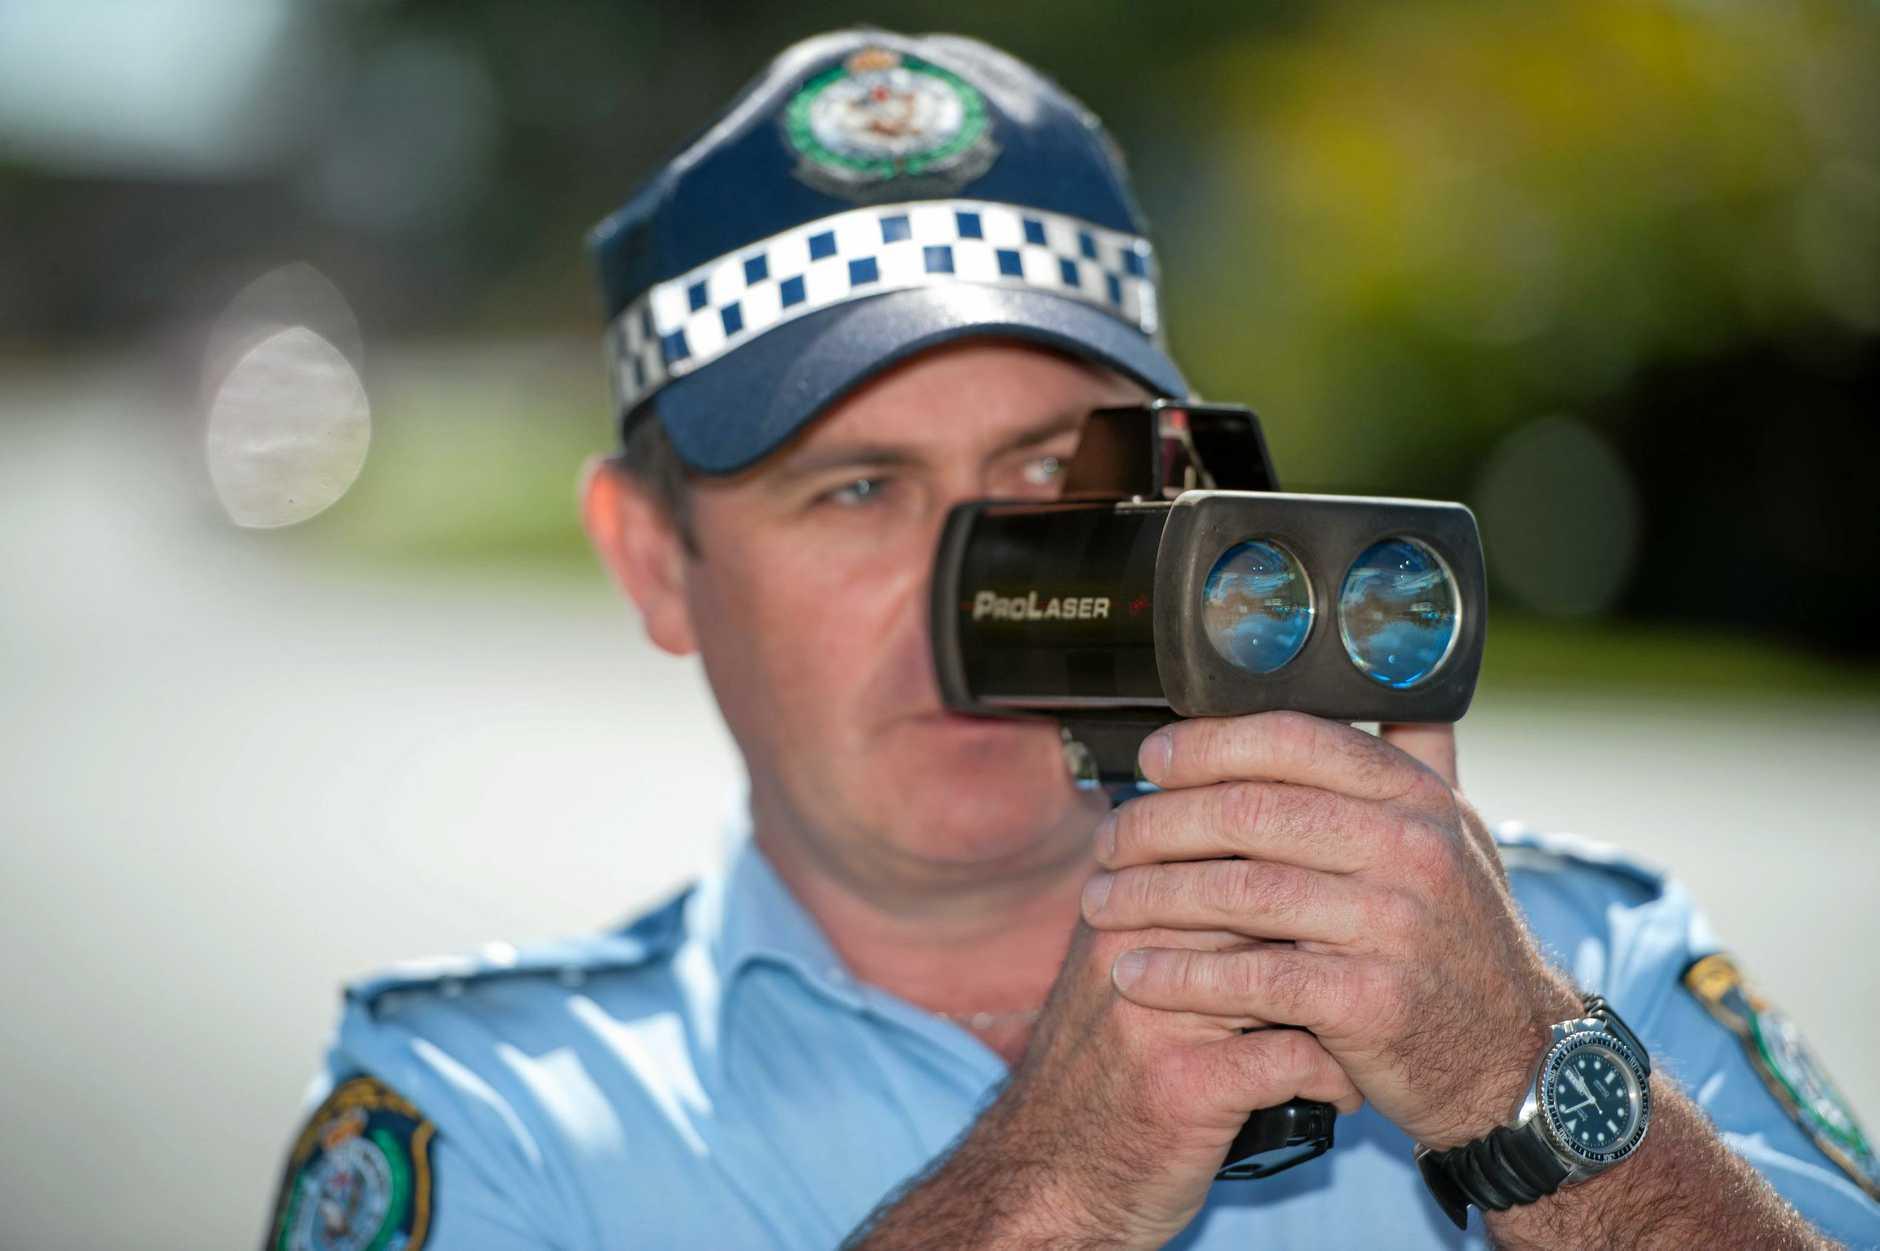 NSW police speed gun, radar.Snr. Const  Mark Whittaker. 07 October 2016